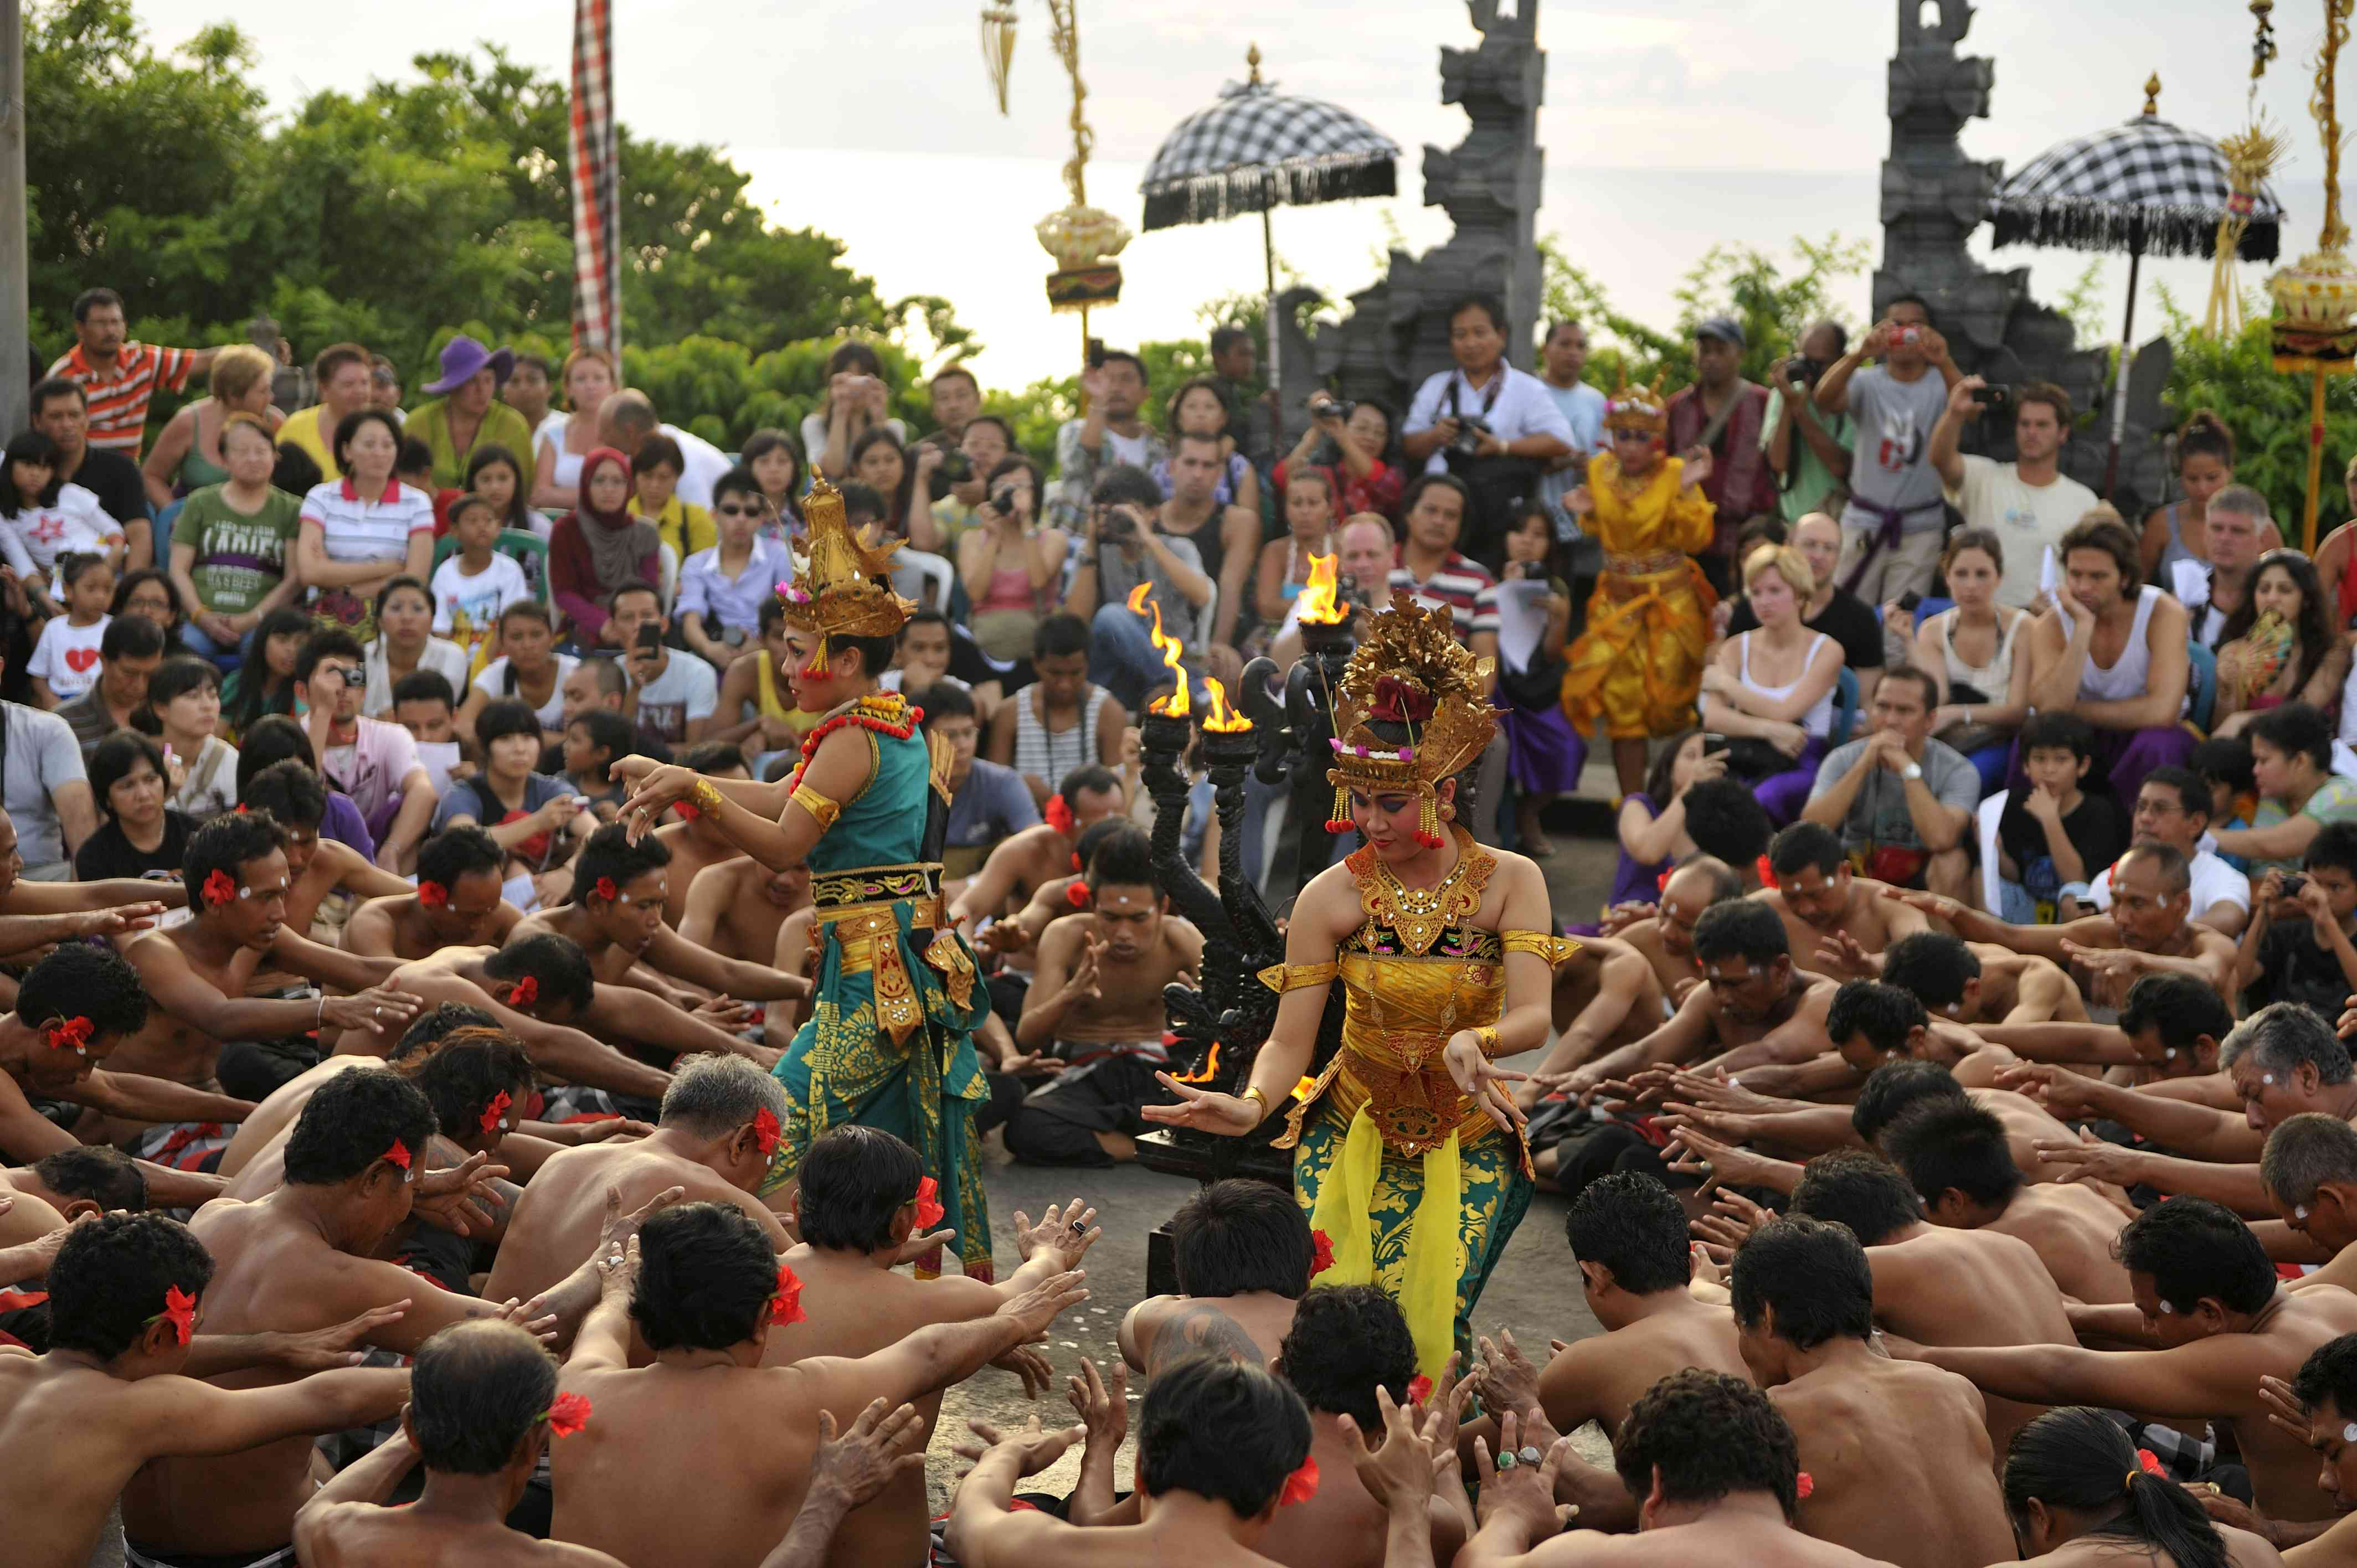 Kecak traditional dancers at Uluwatu in Bali